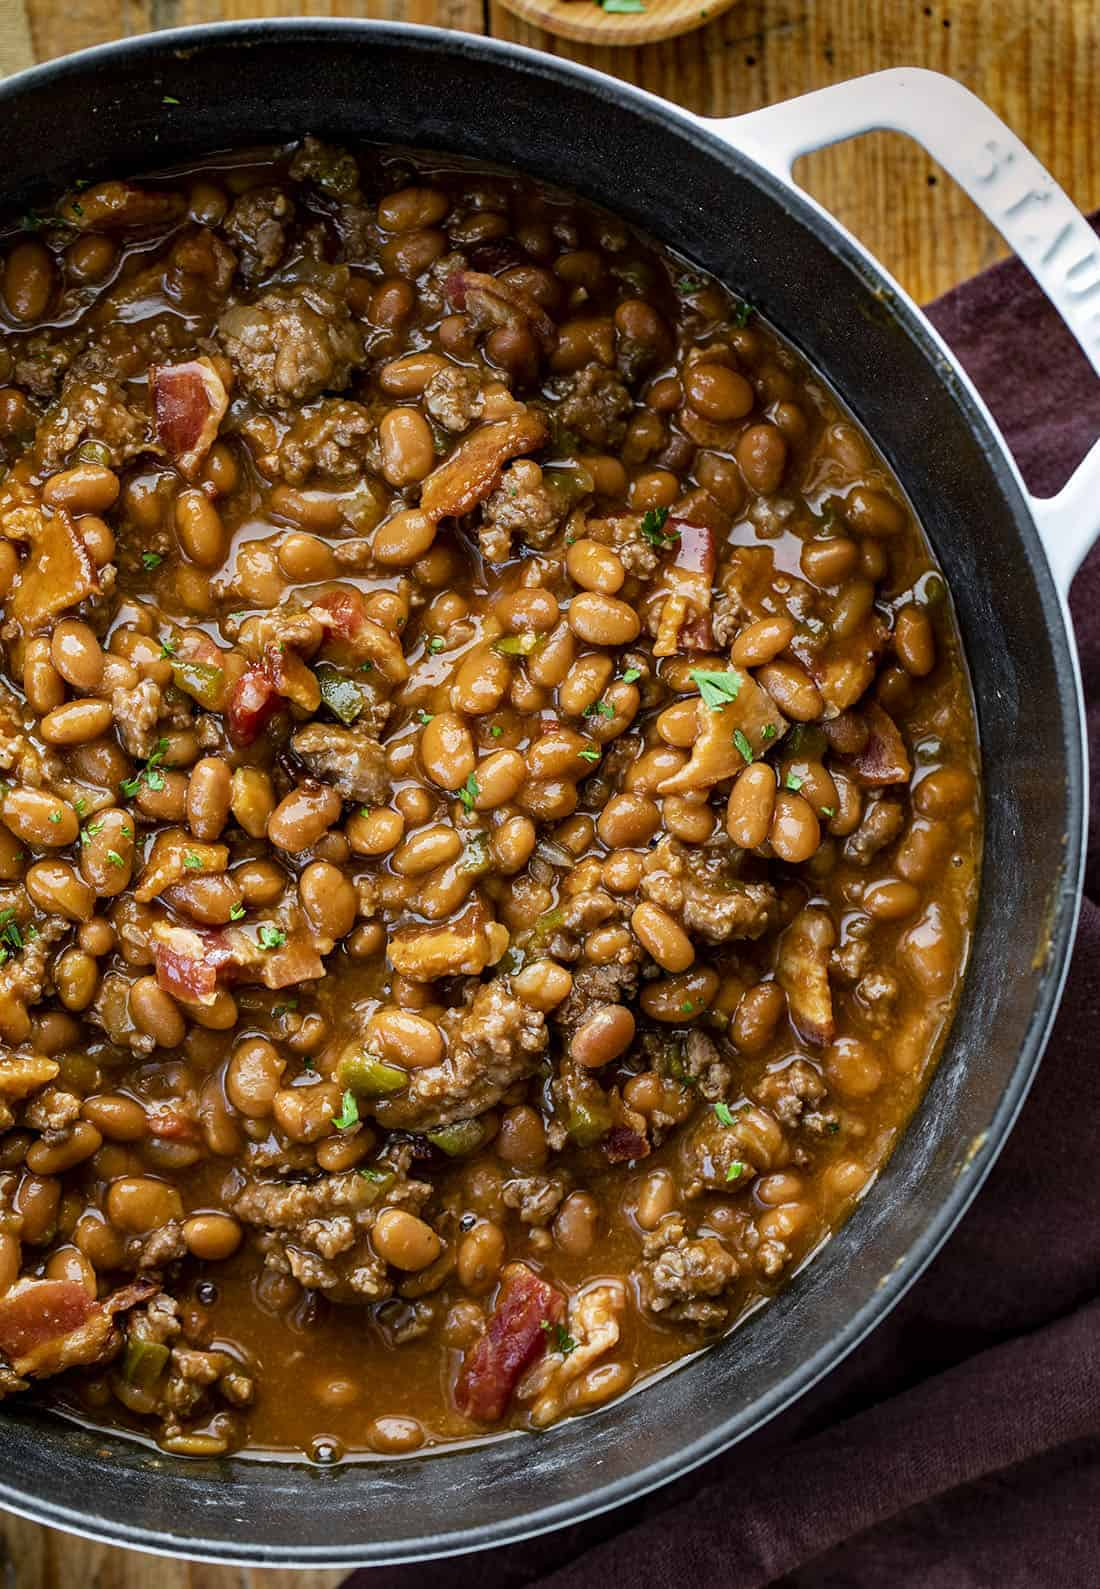 Cowboy Beans Recipe in Pot